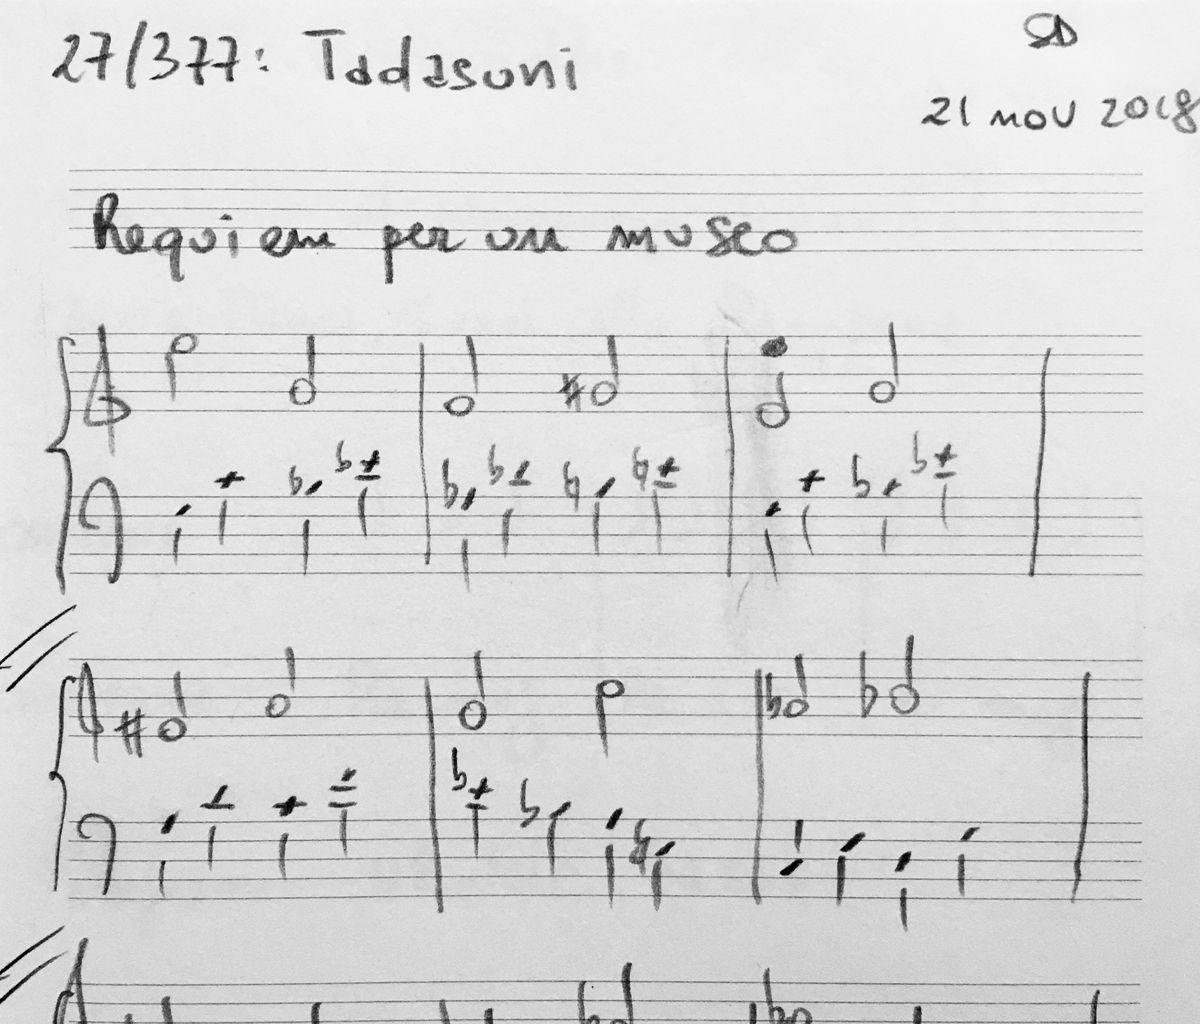 027-Tadasuni-score